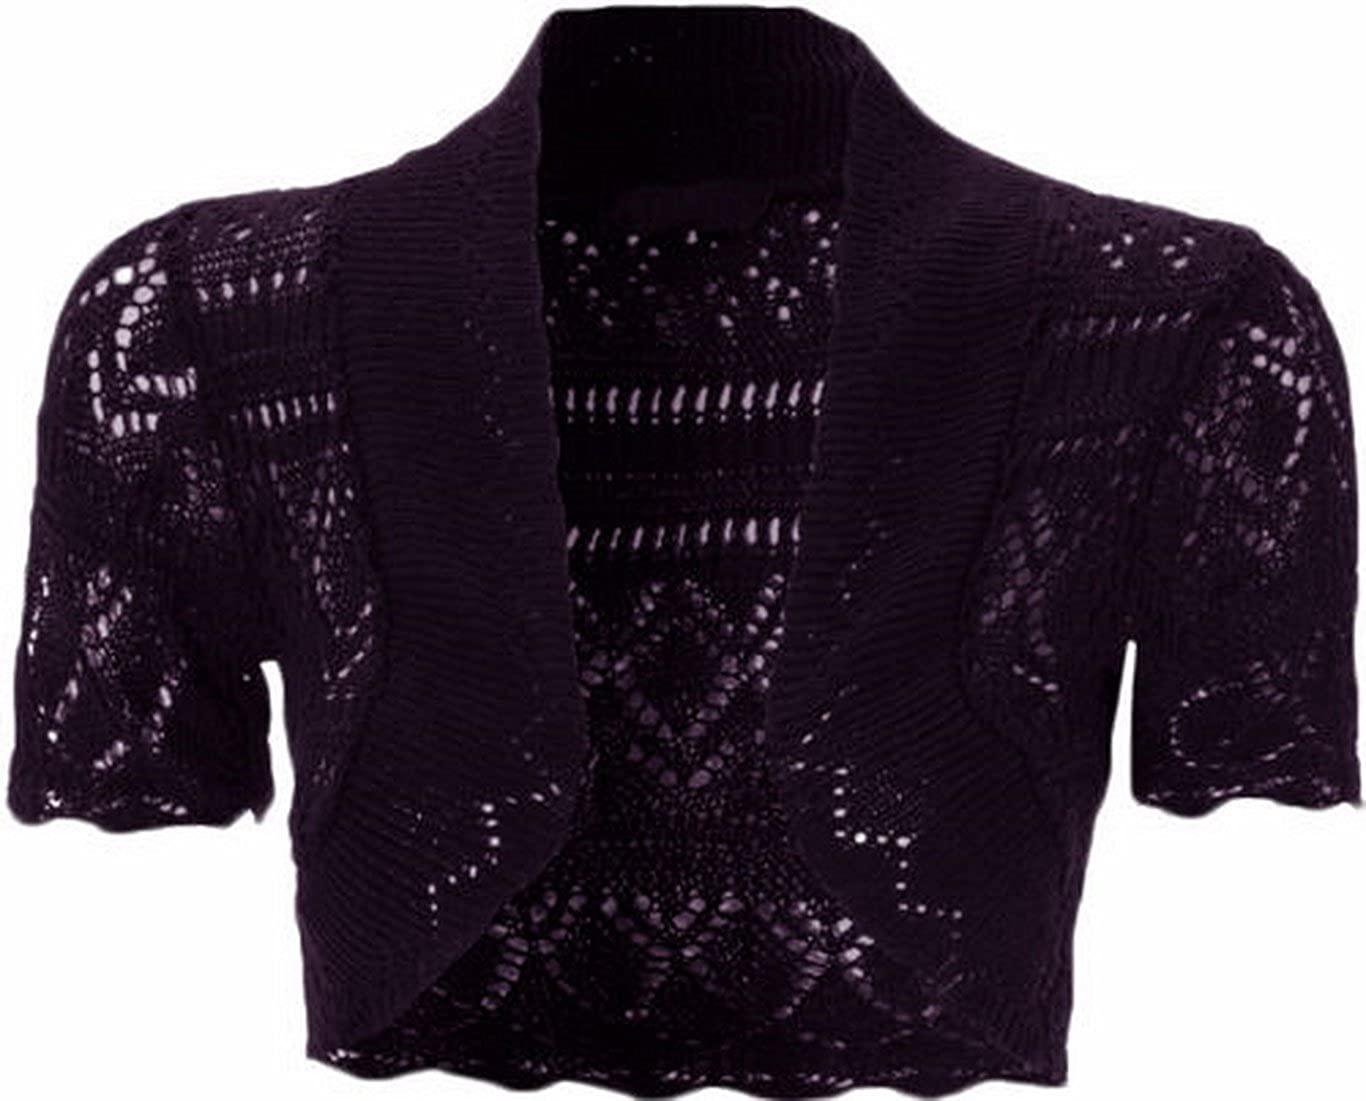 Womens Knitted Bolero Shrug Short Sleeve Crochet Shrug (L, Purple)